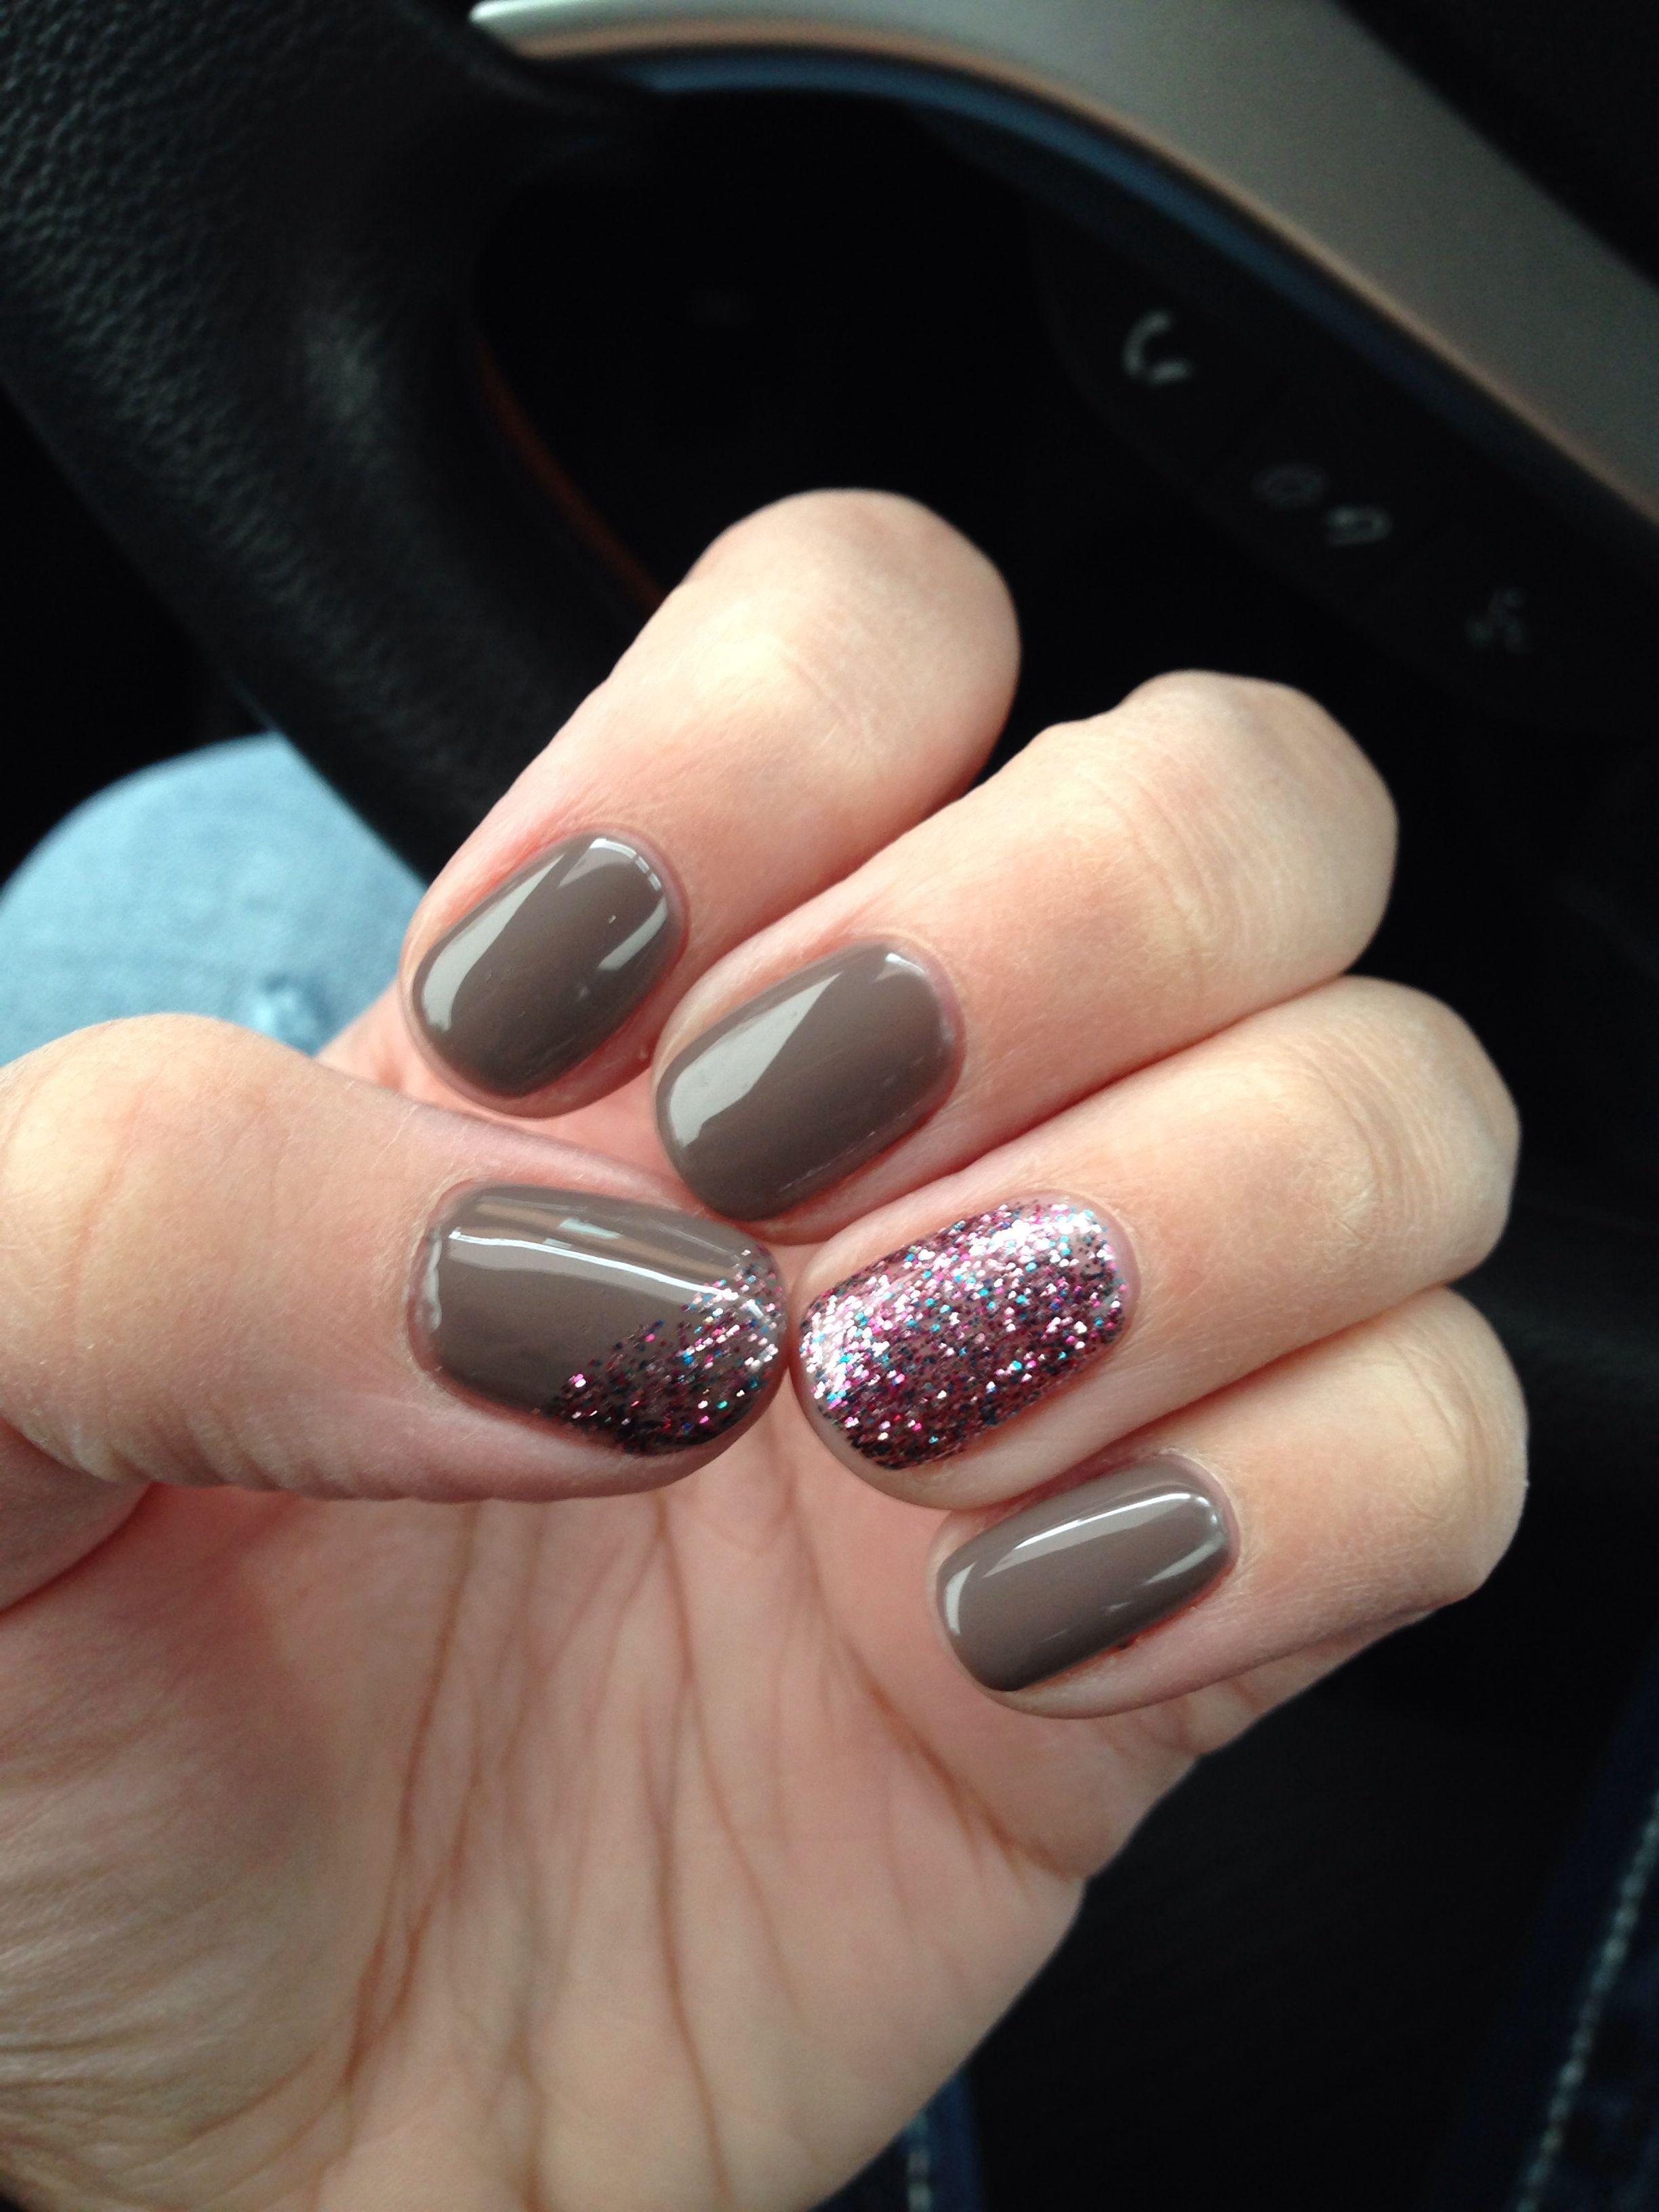 Christy Cs Sasssycc Nails Aprilsnailz Cnd Shellac Rubble